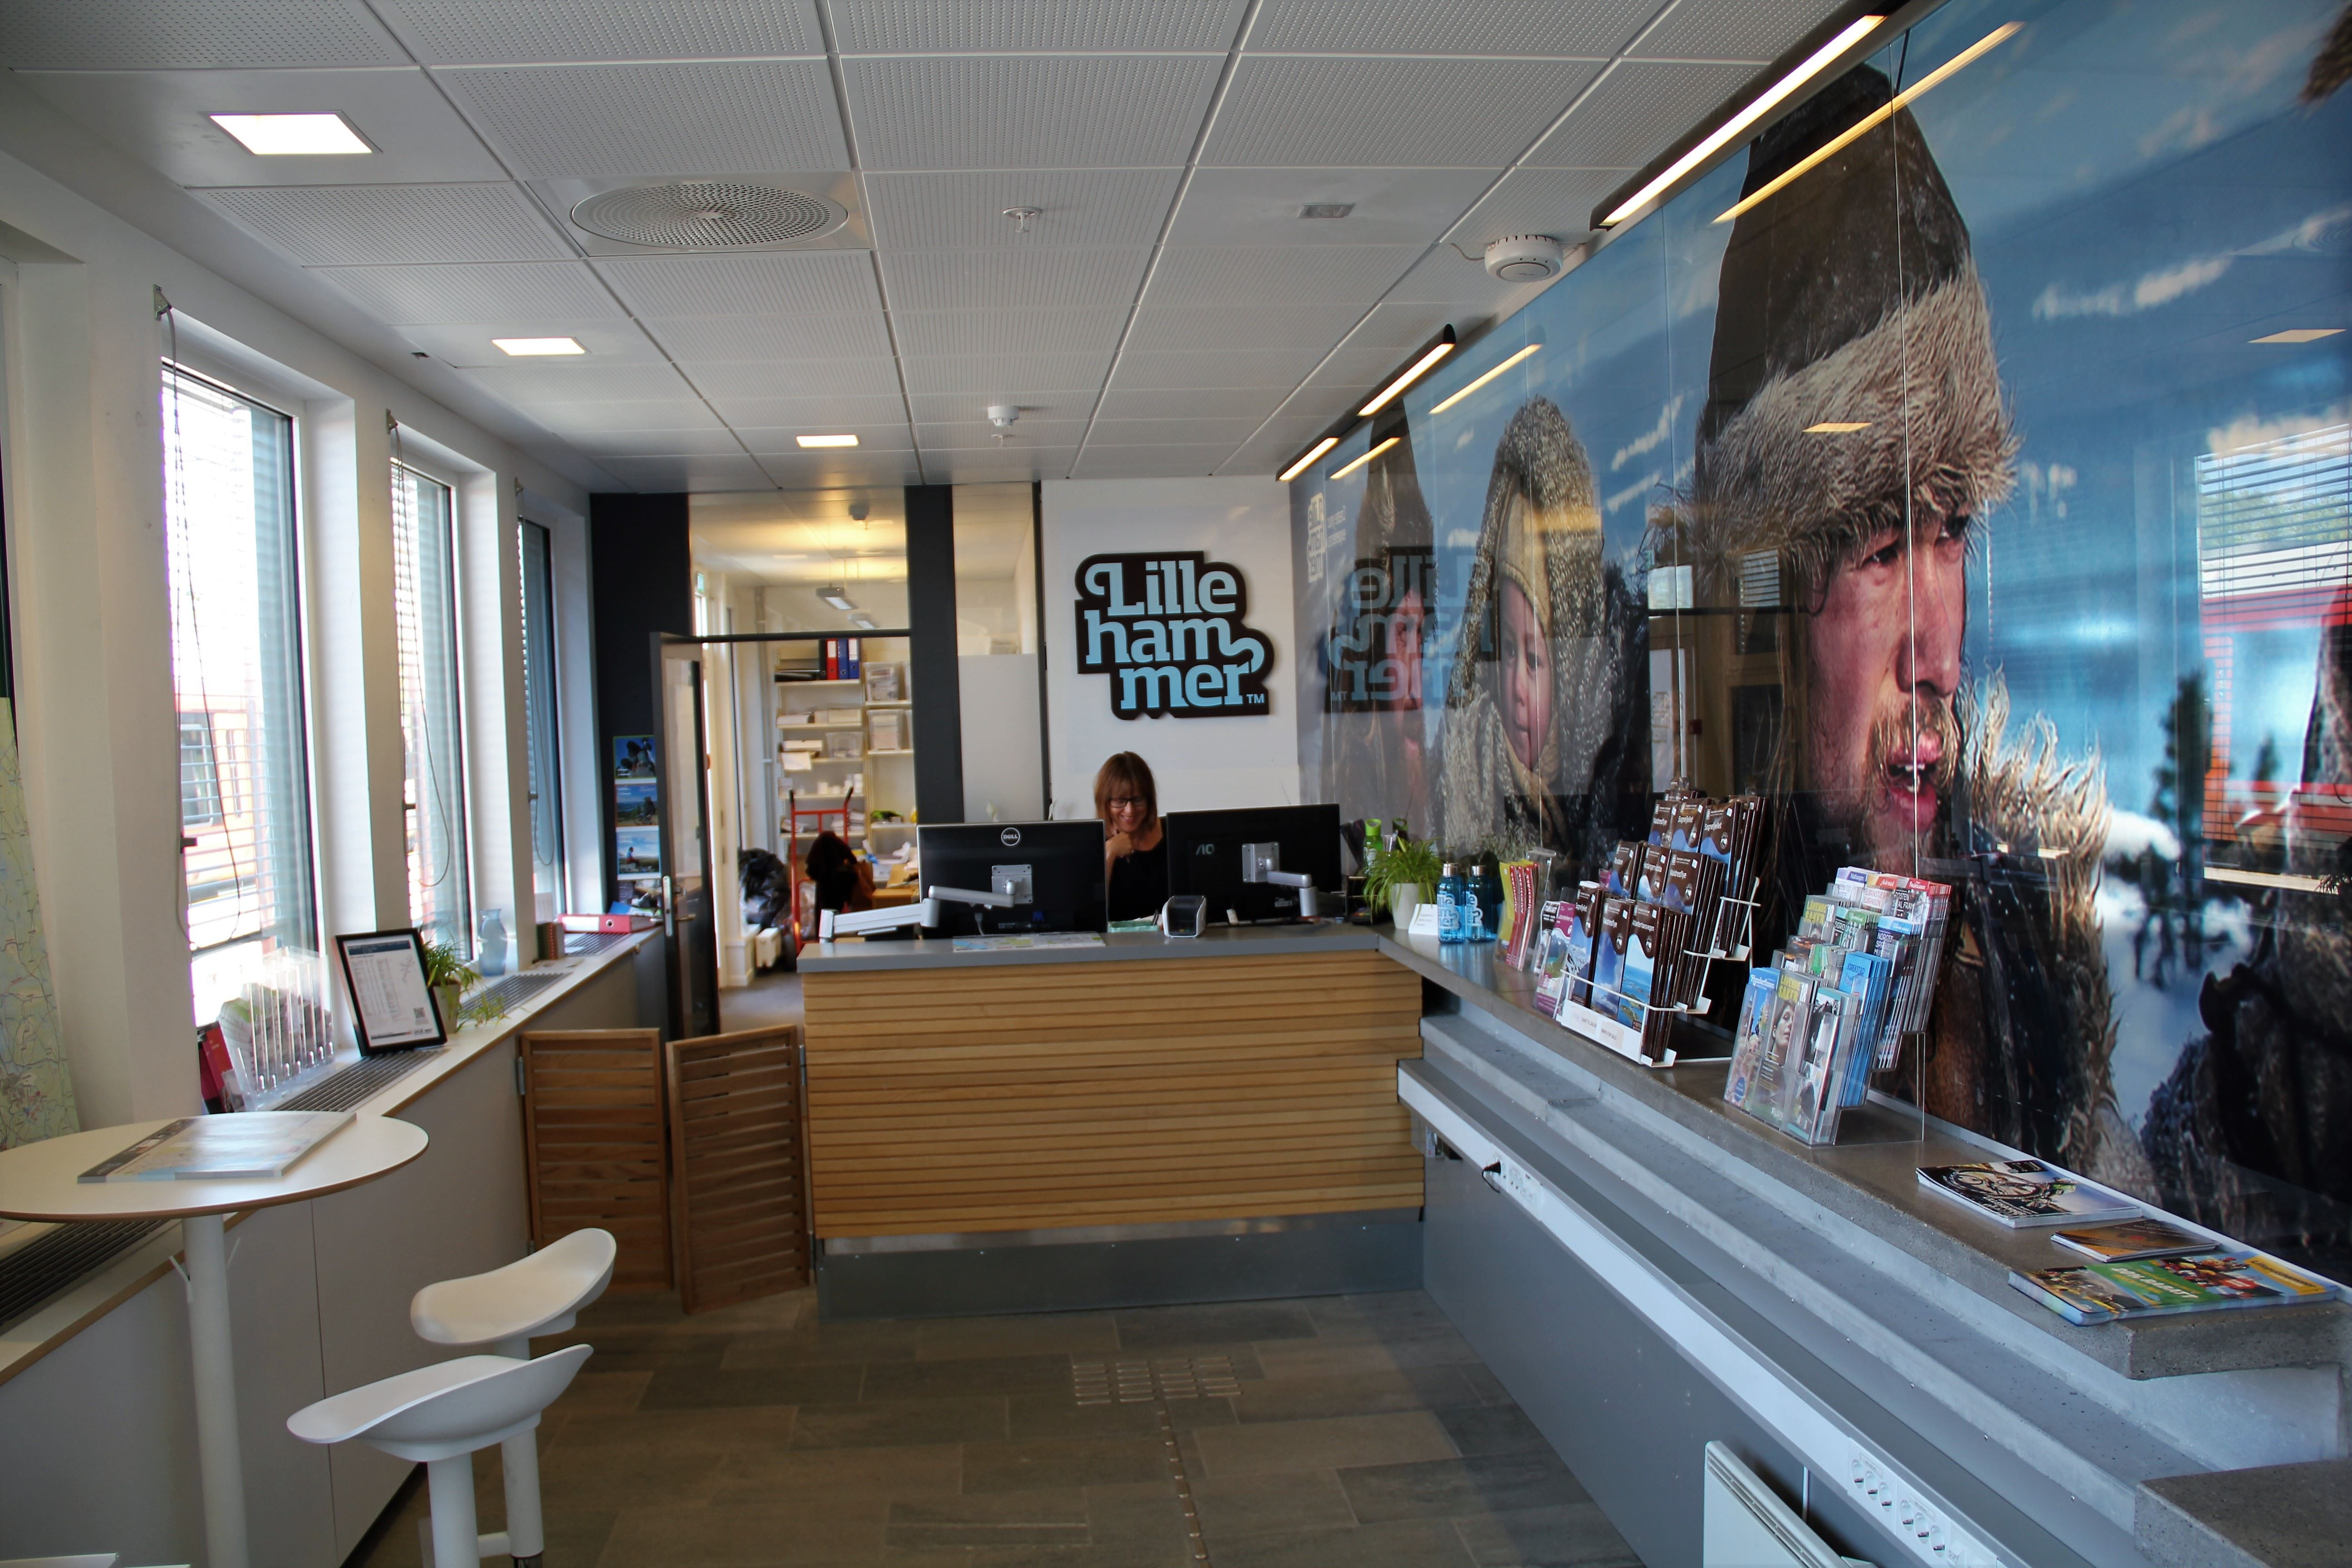 Information centre for visitors in Lillehammer region